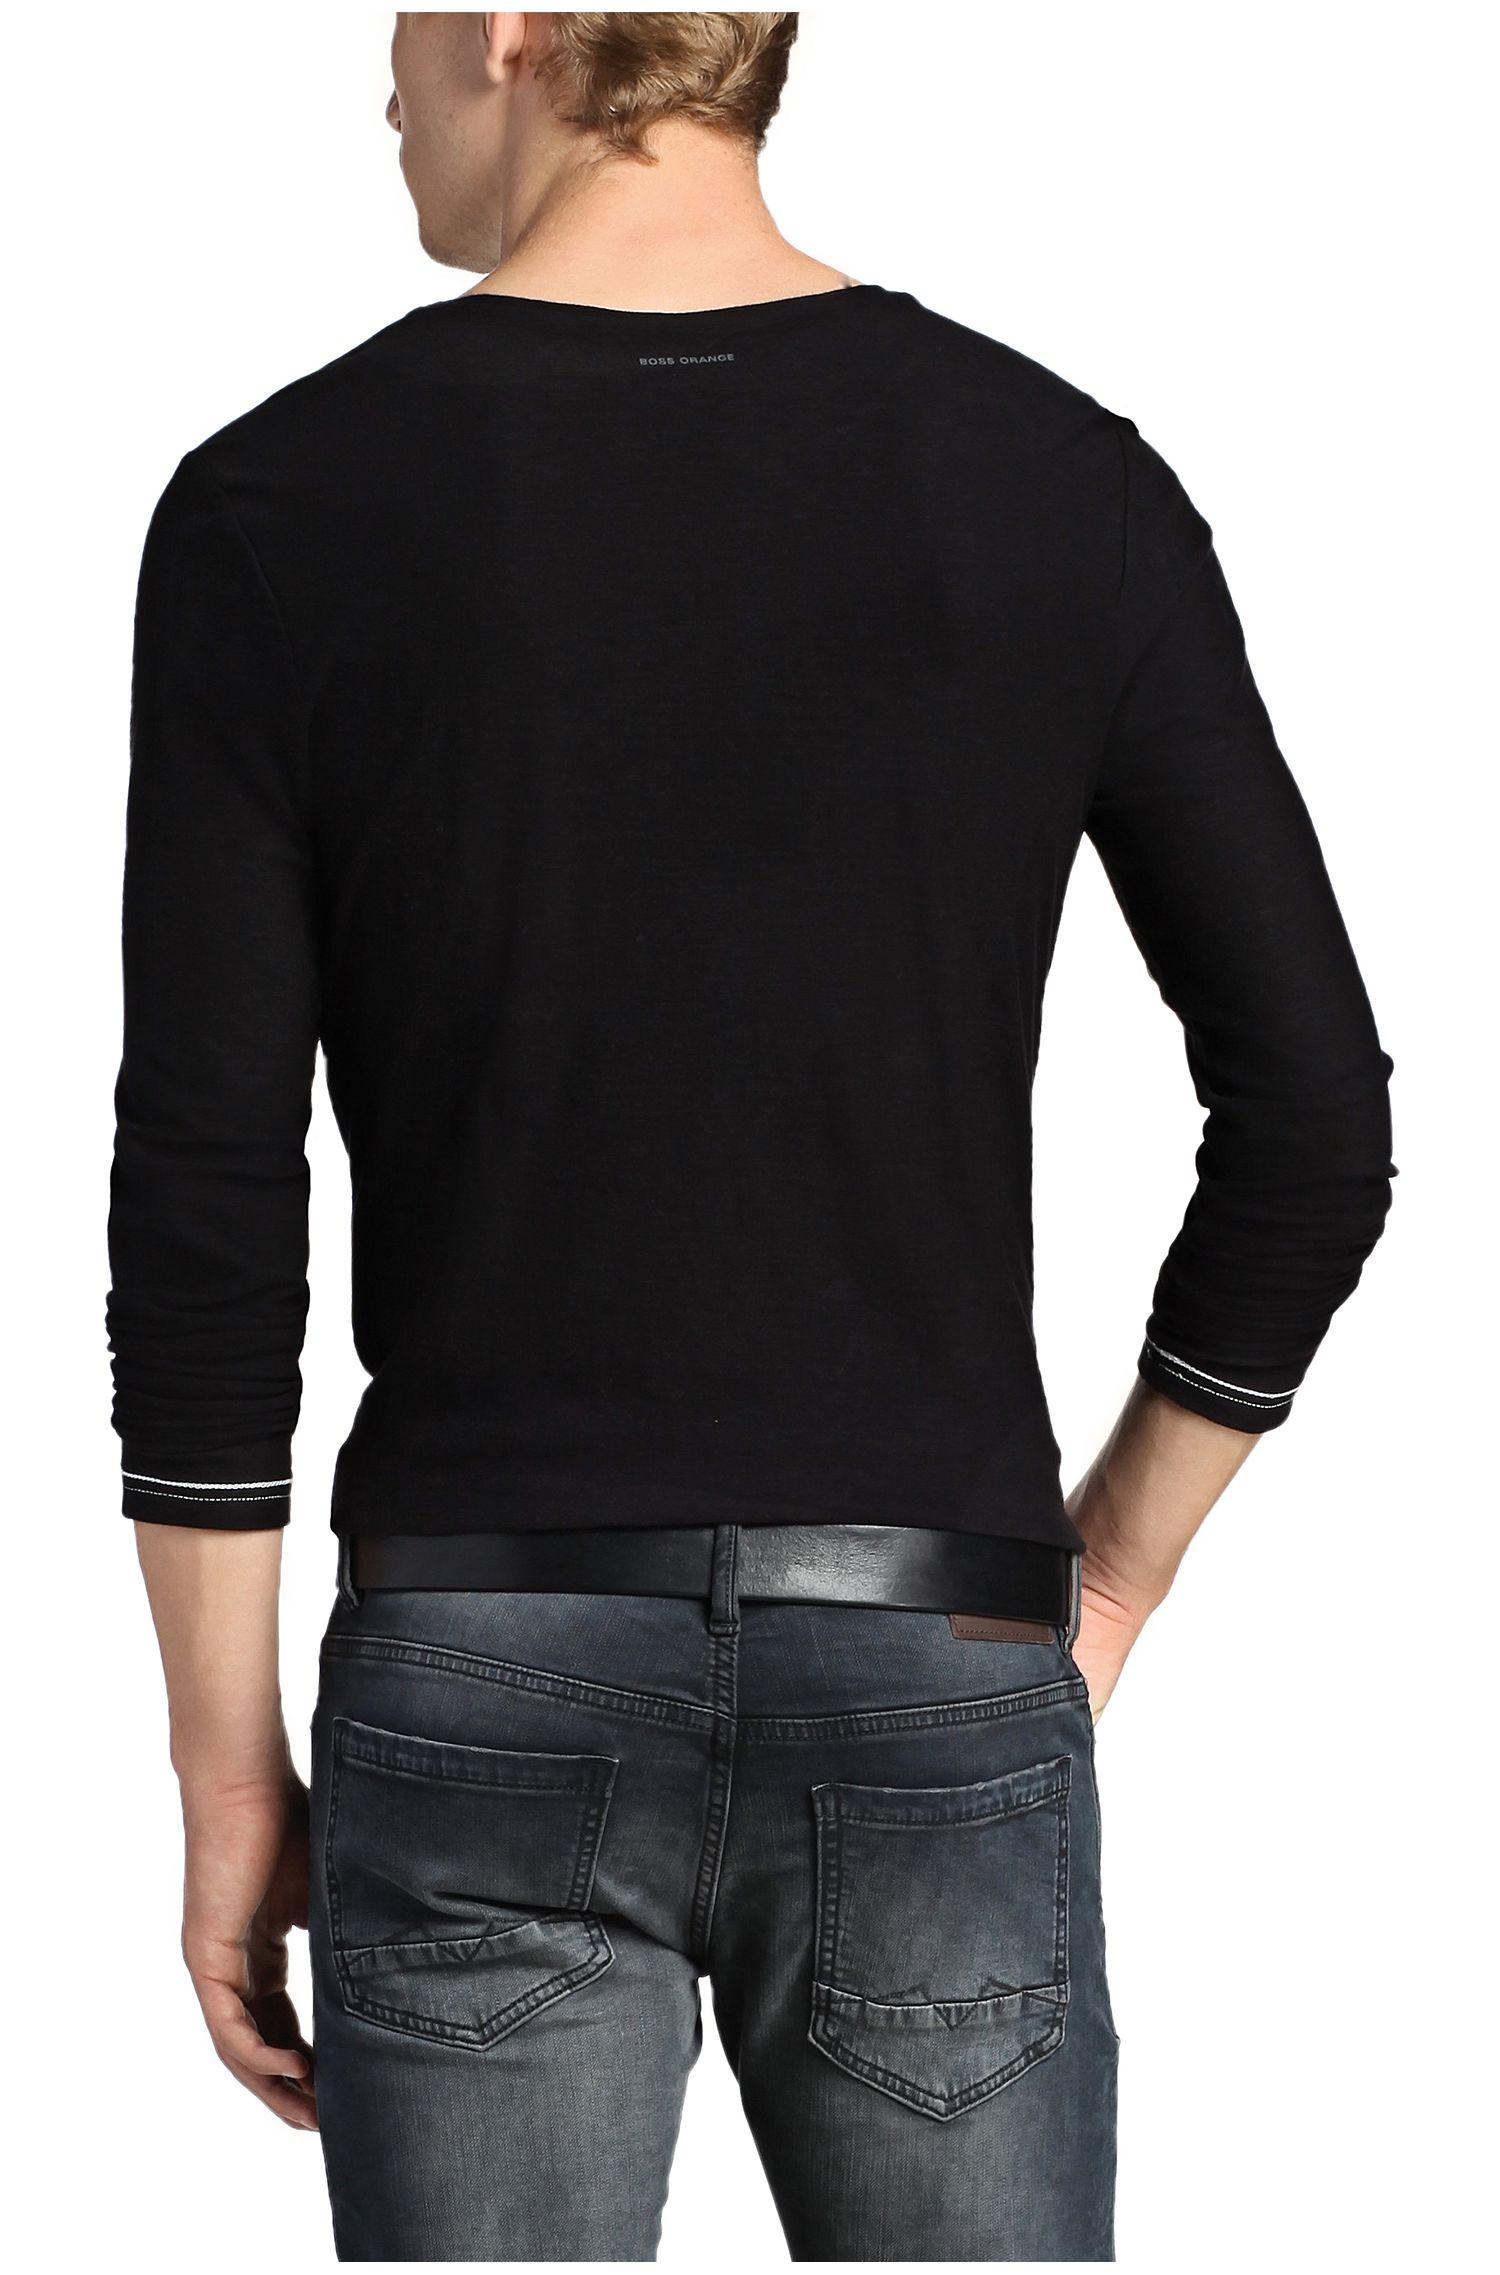 T-shirt manches longues «Tracked3» en coton